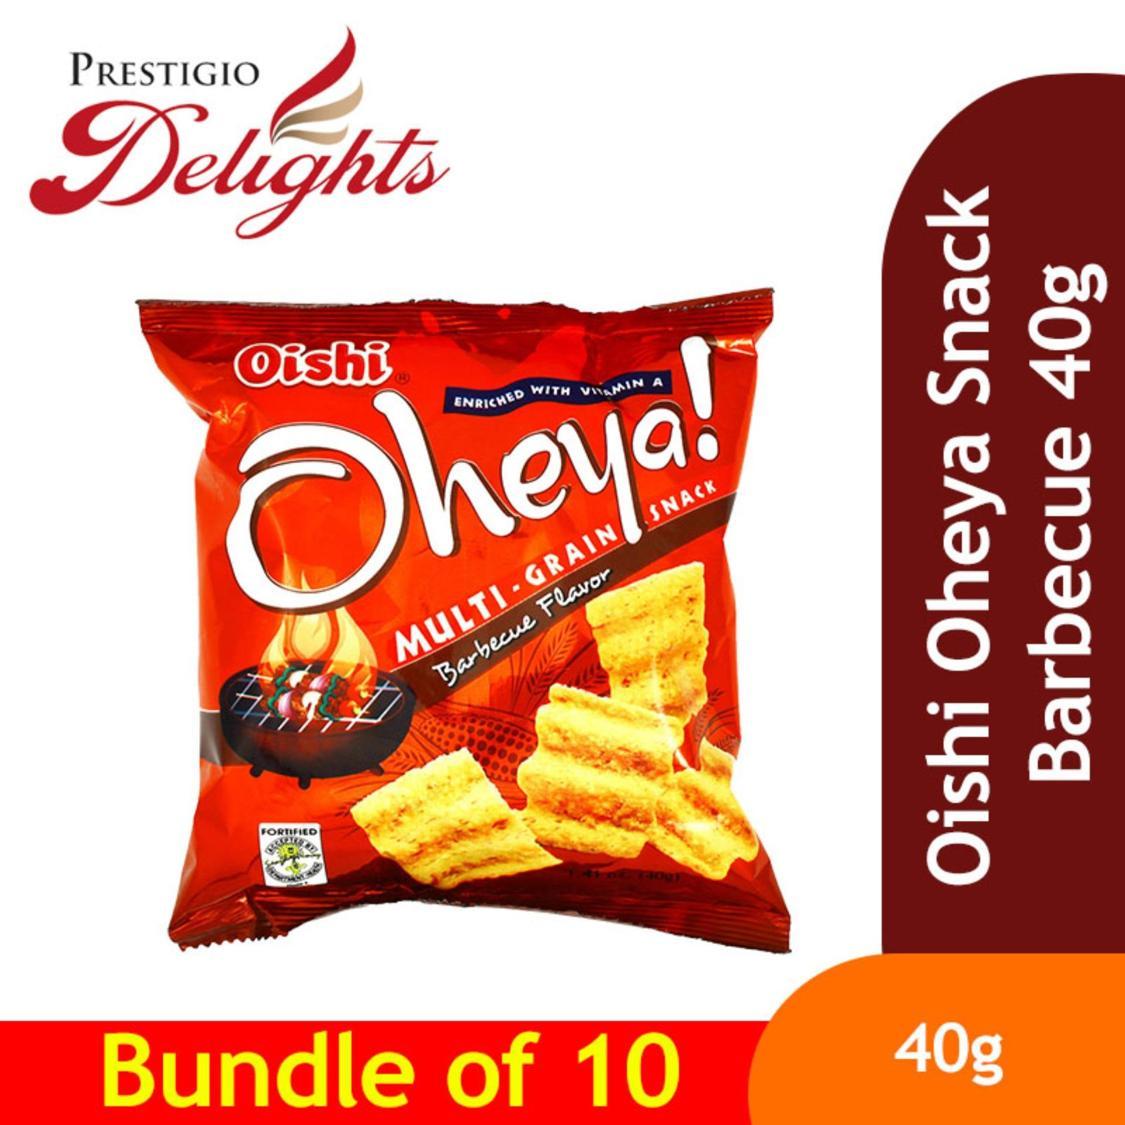 Oishi Oheya Snack Barbecue 40g Bundle Of 10 By Prestigio Delights.